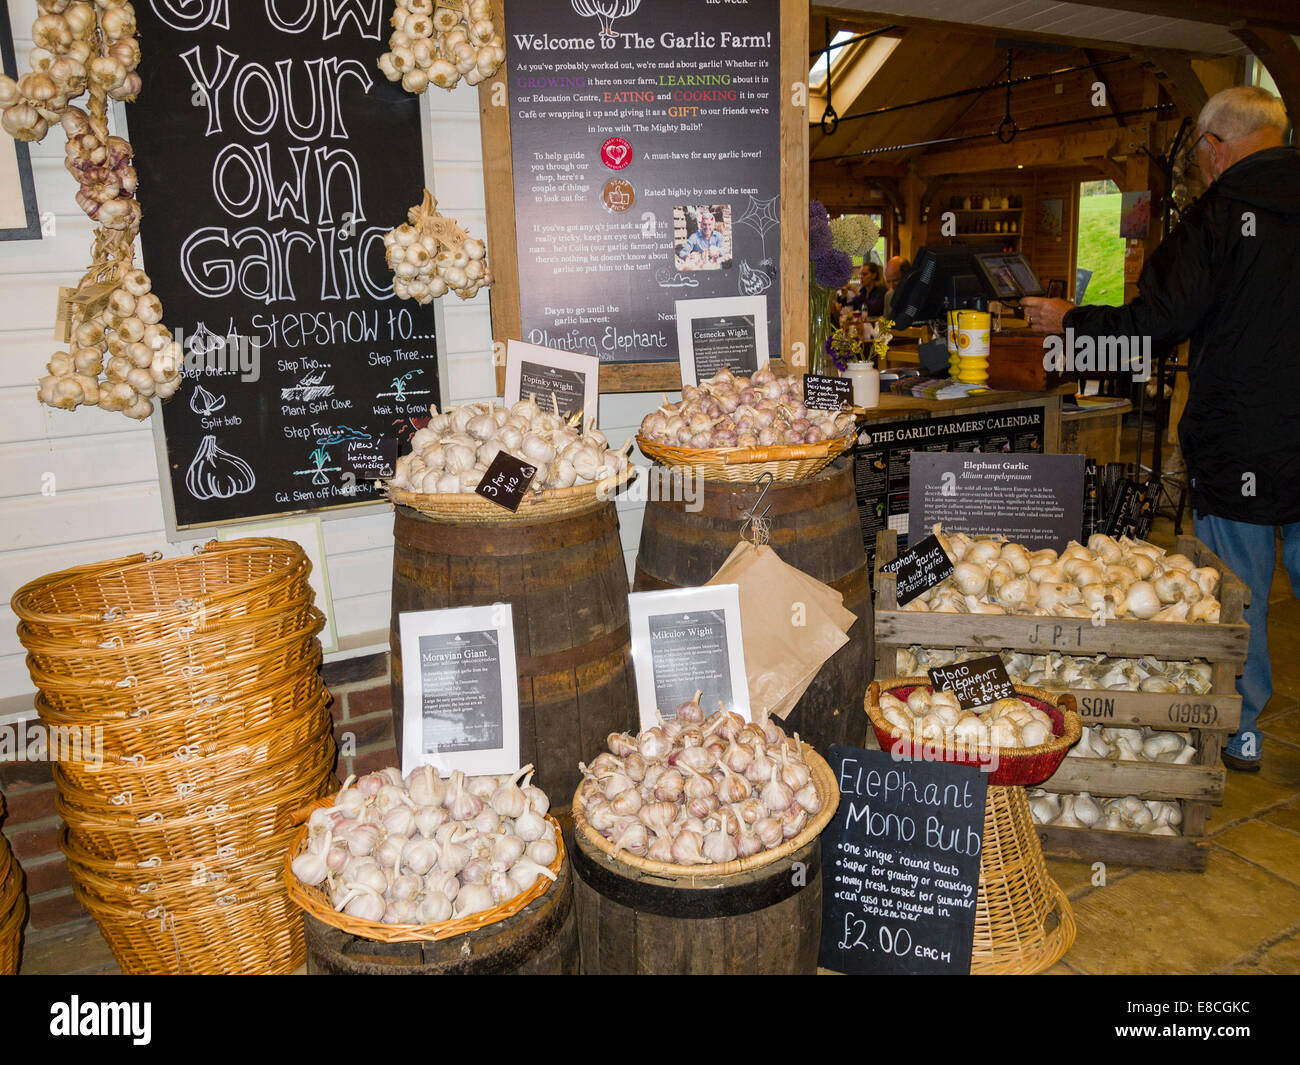 Bulbs of various types of garlic, Garlic Farm Shop, Isle of Wight, England, UK - Stock Image